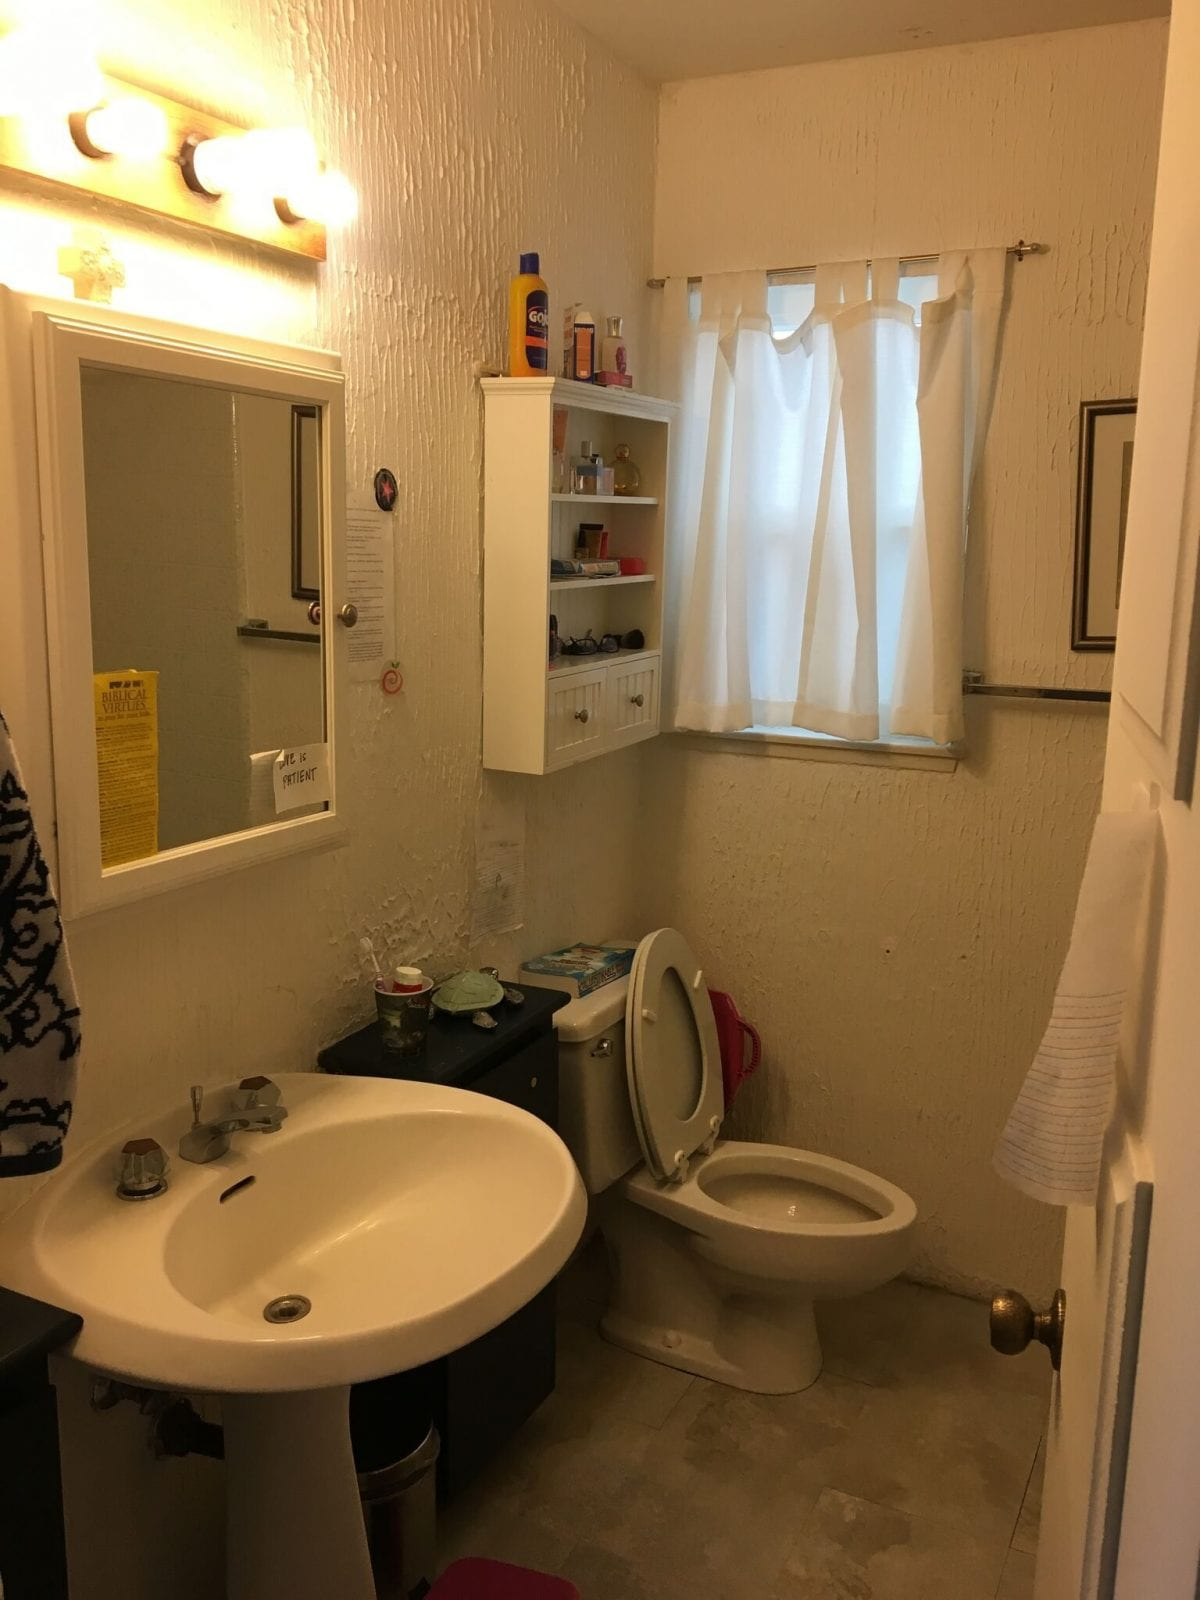 A Small Kids Bathroom Inspiration The Handmade Home